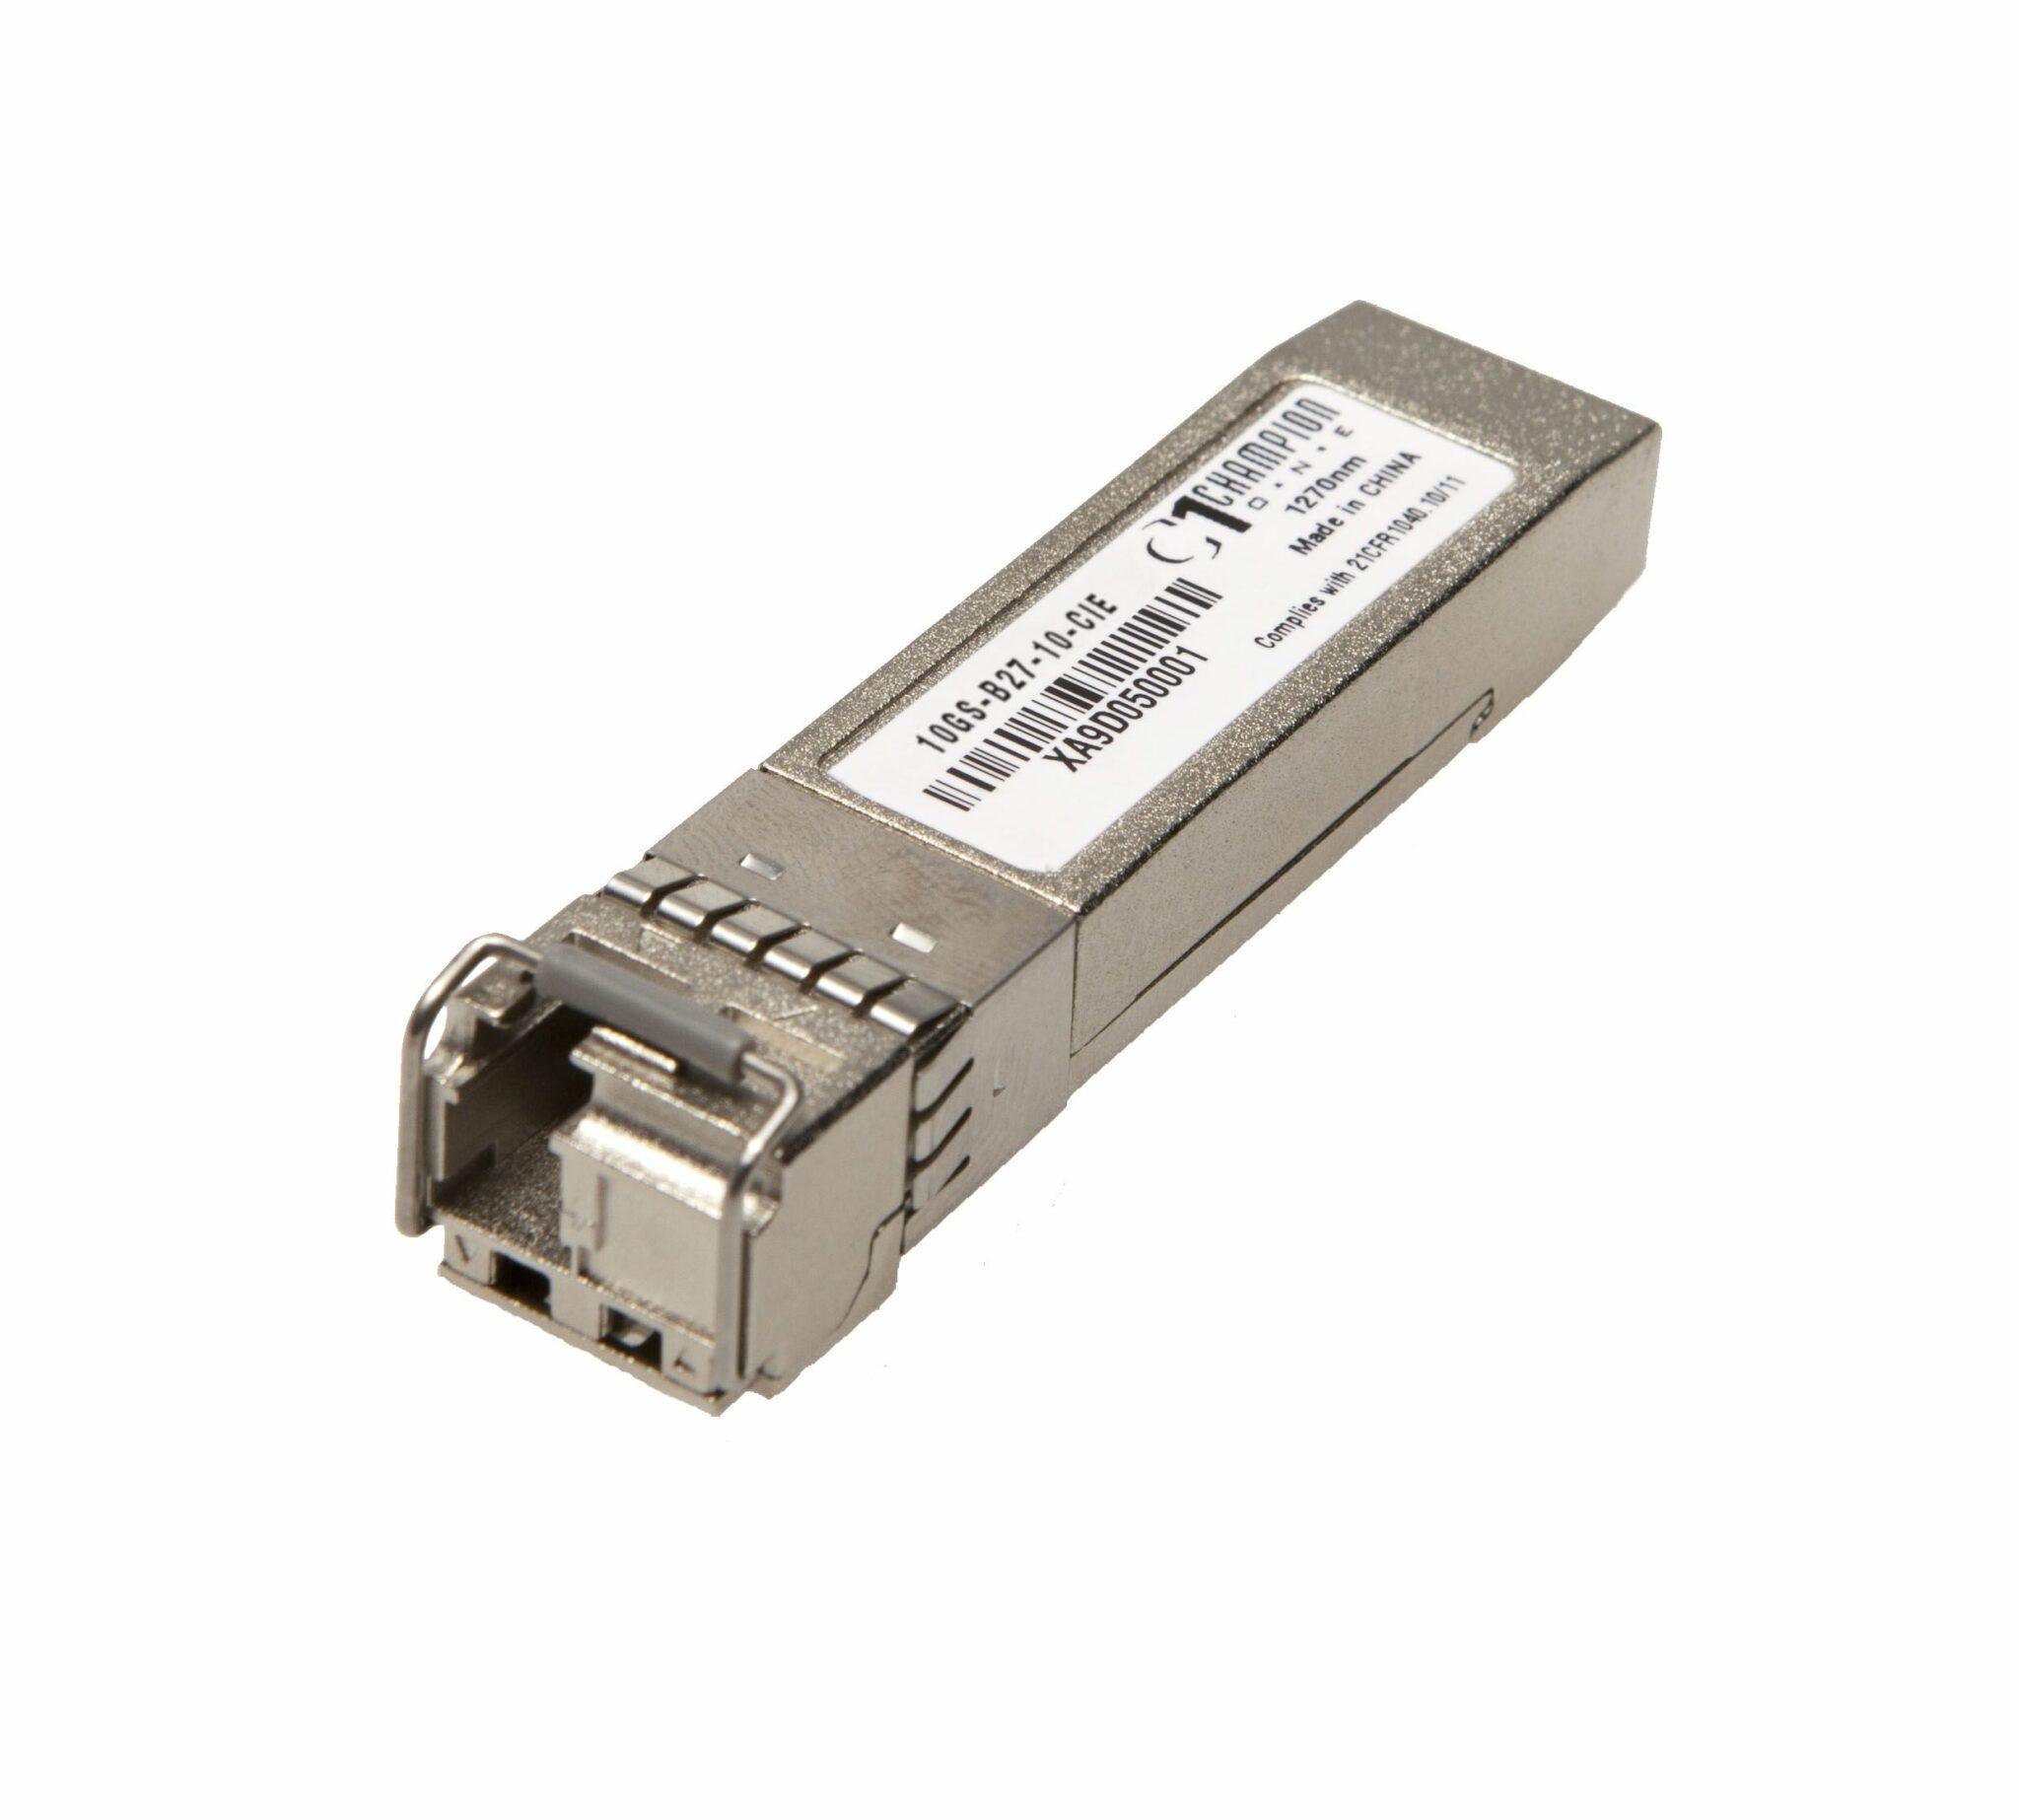 SFP+ SF 10GBase-LR 1270nm 10km, Ciena compatible